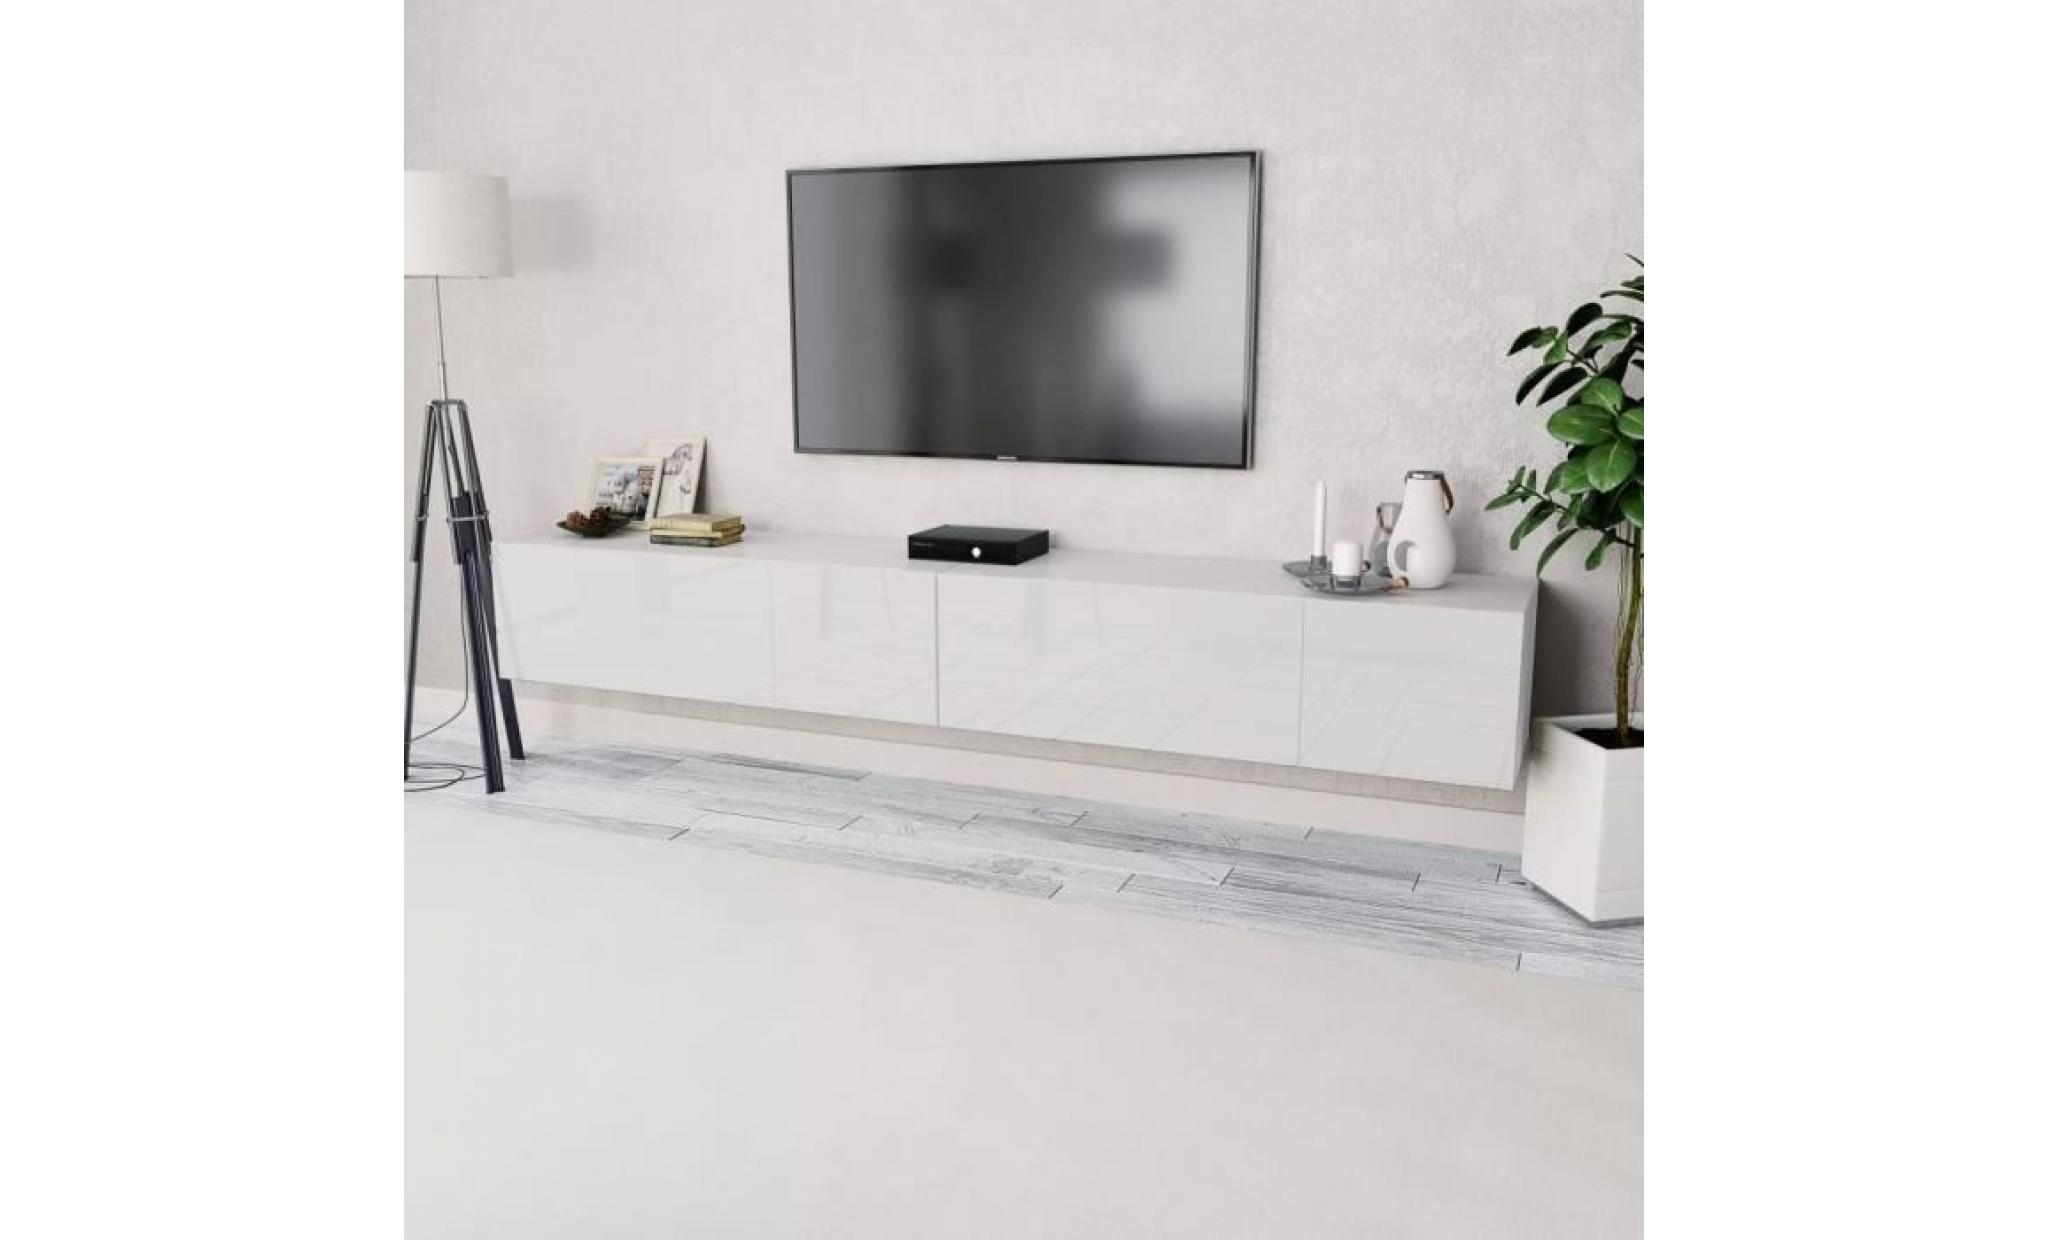 Meuble Tv 2 Pcs Agglomere 120 X 40 X 34 Cm Blanc Brillant Muble Tv Mural Contemporain Scandinave